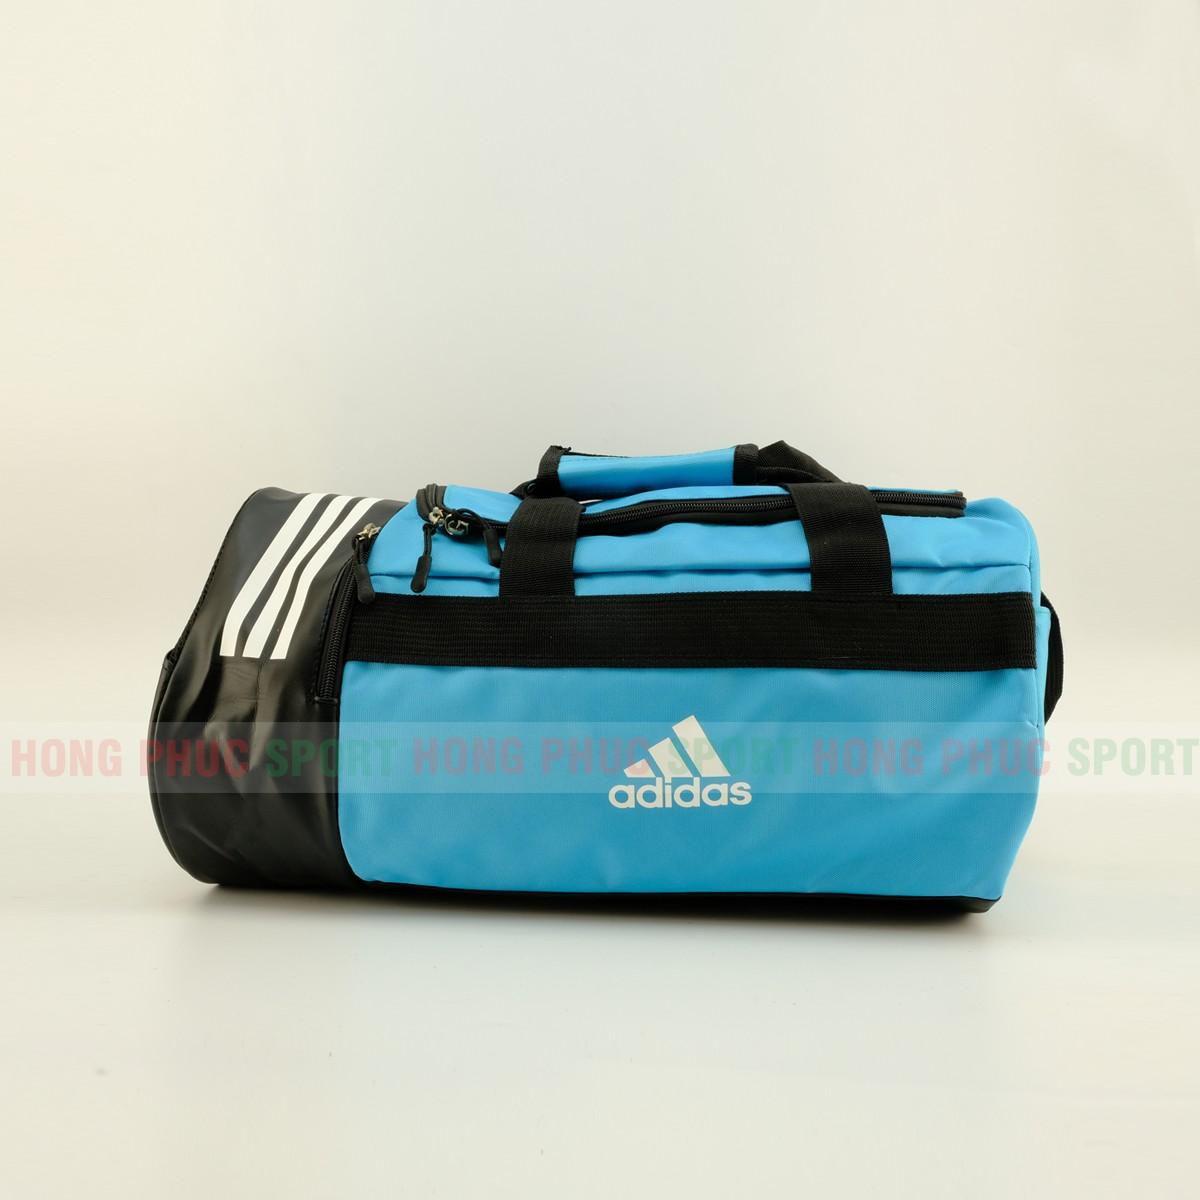 https://cdn.hongphucsport.com/unsafe/cdn.hongphucsport.com/dothethao.net.vn/wp-content/uploads/2019/09/tui-trong-the-thao-adidas-co-ngan-dung-giay-mau-xanh-da-troi.jpg